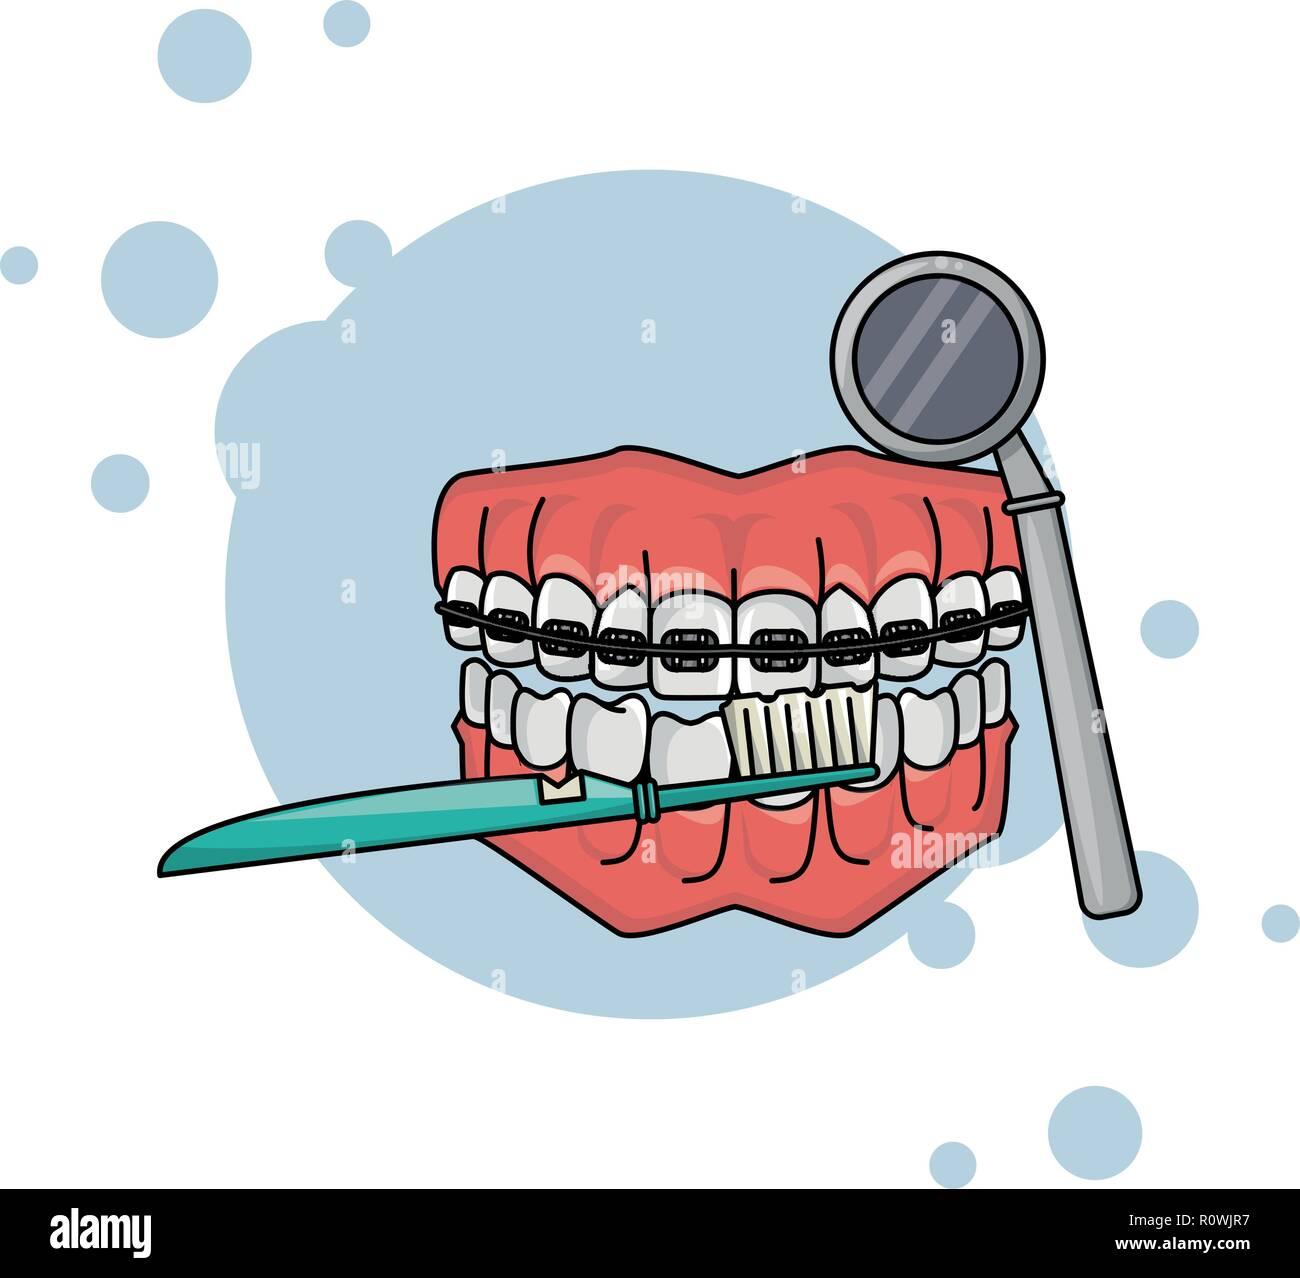 cartoon dental care denture - Stock Image